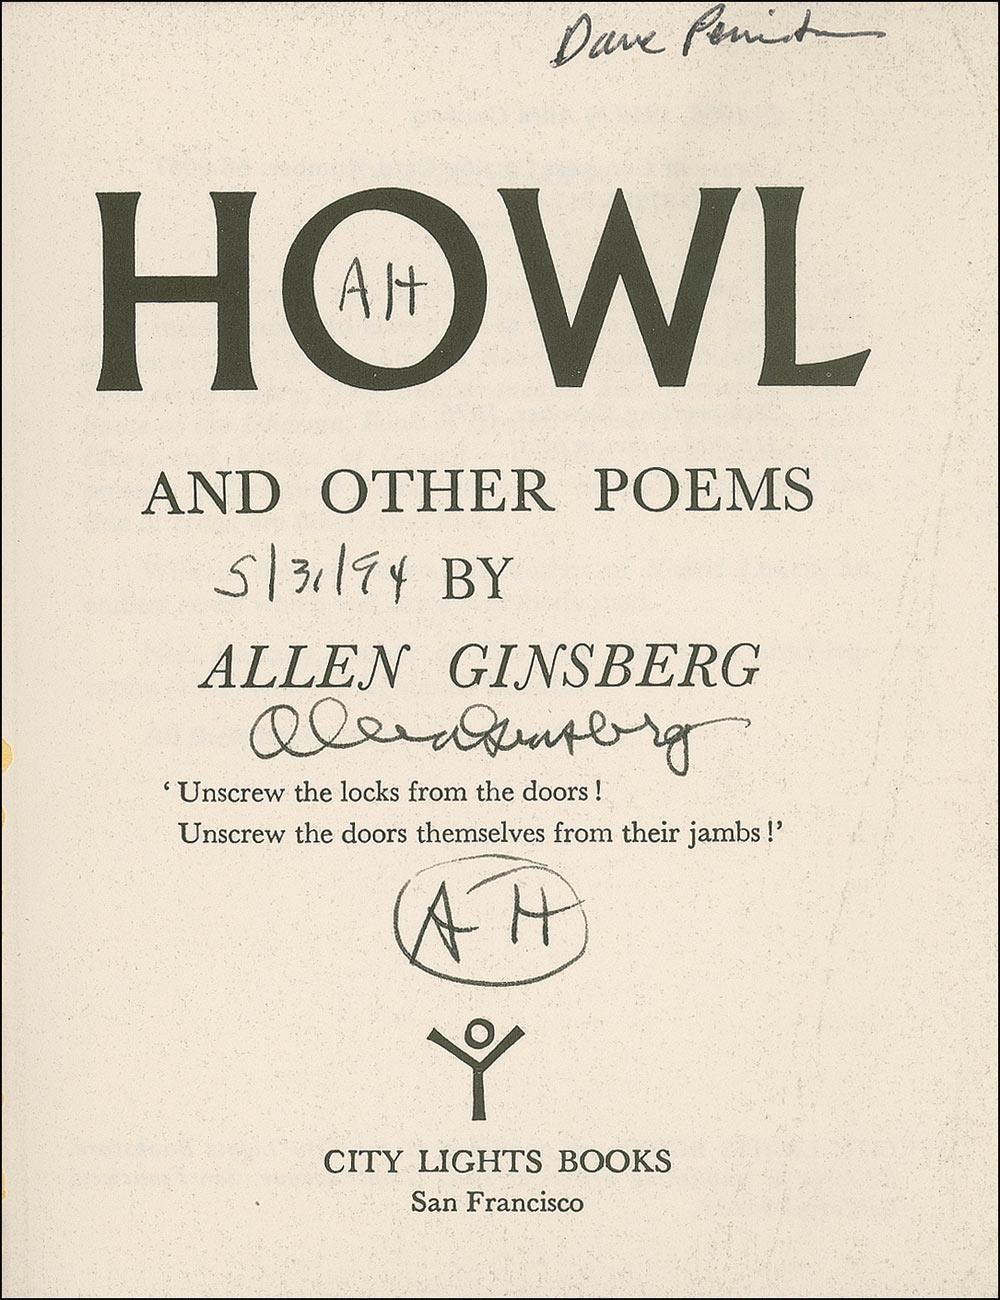 Allen Ginsberg and Lawrence Ferlinghetti